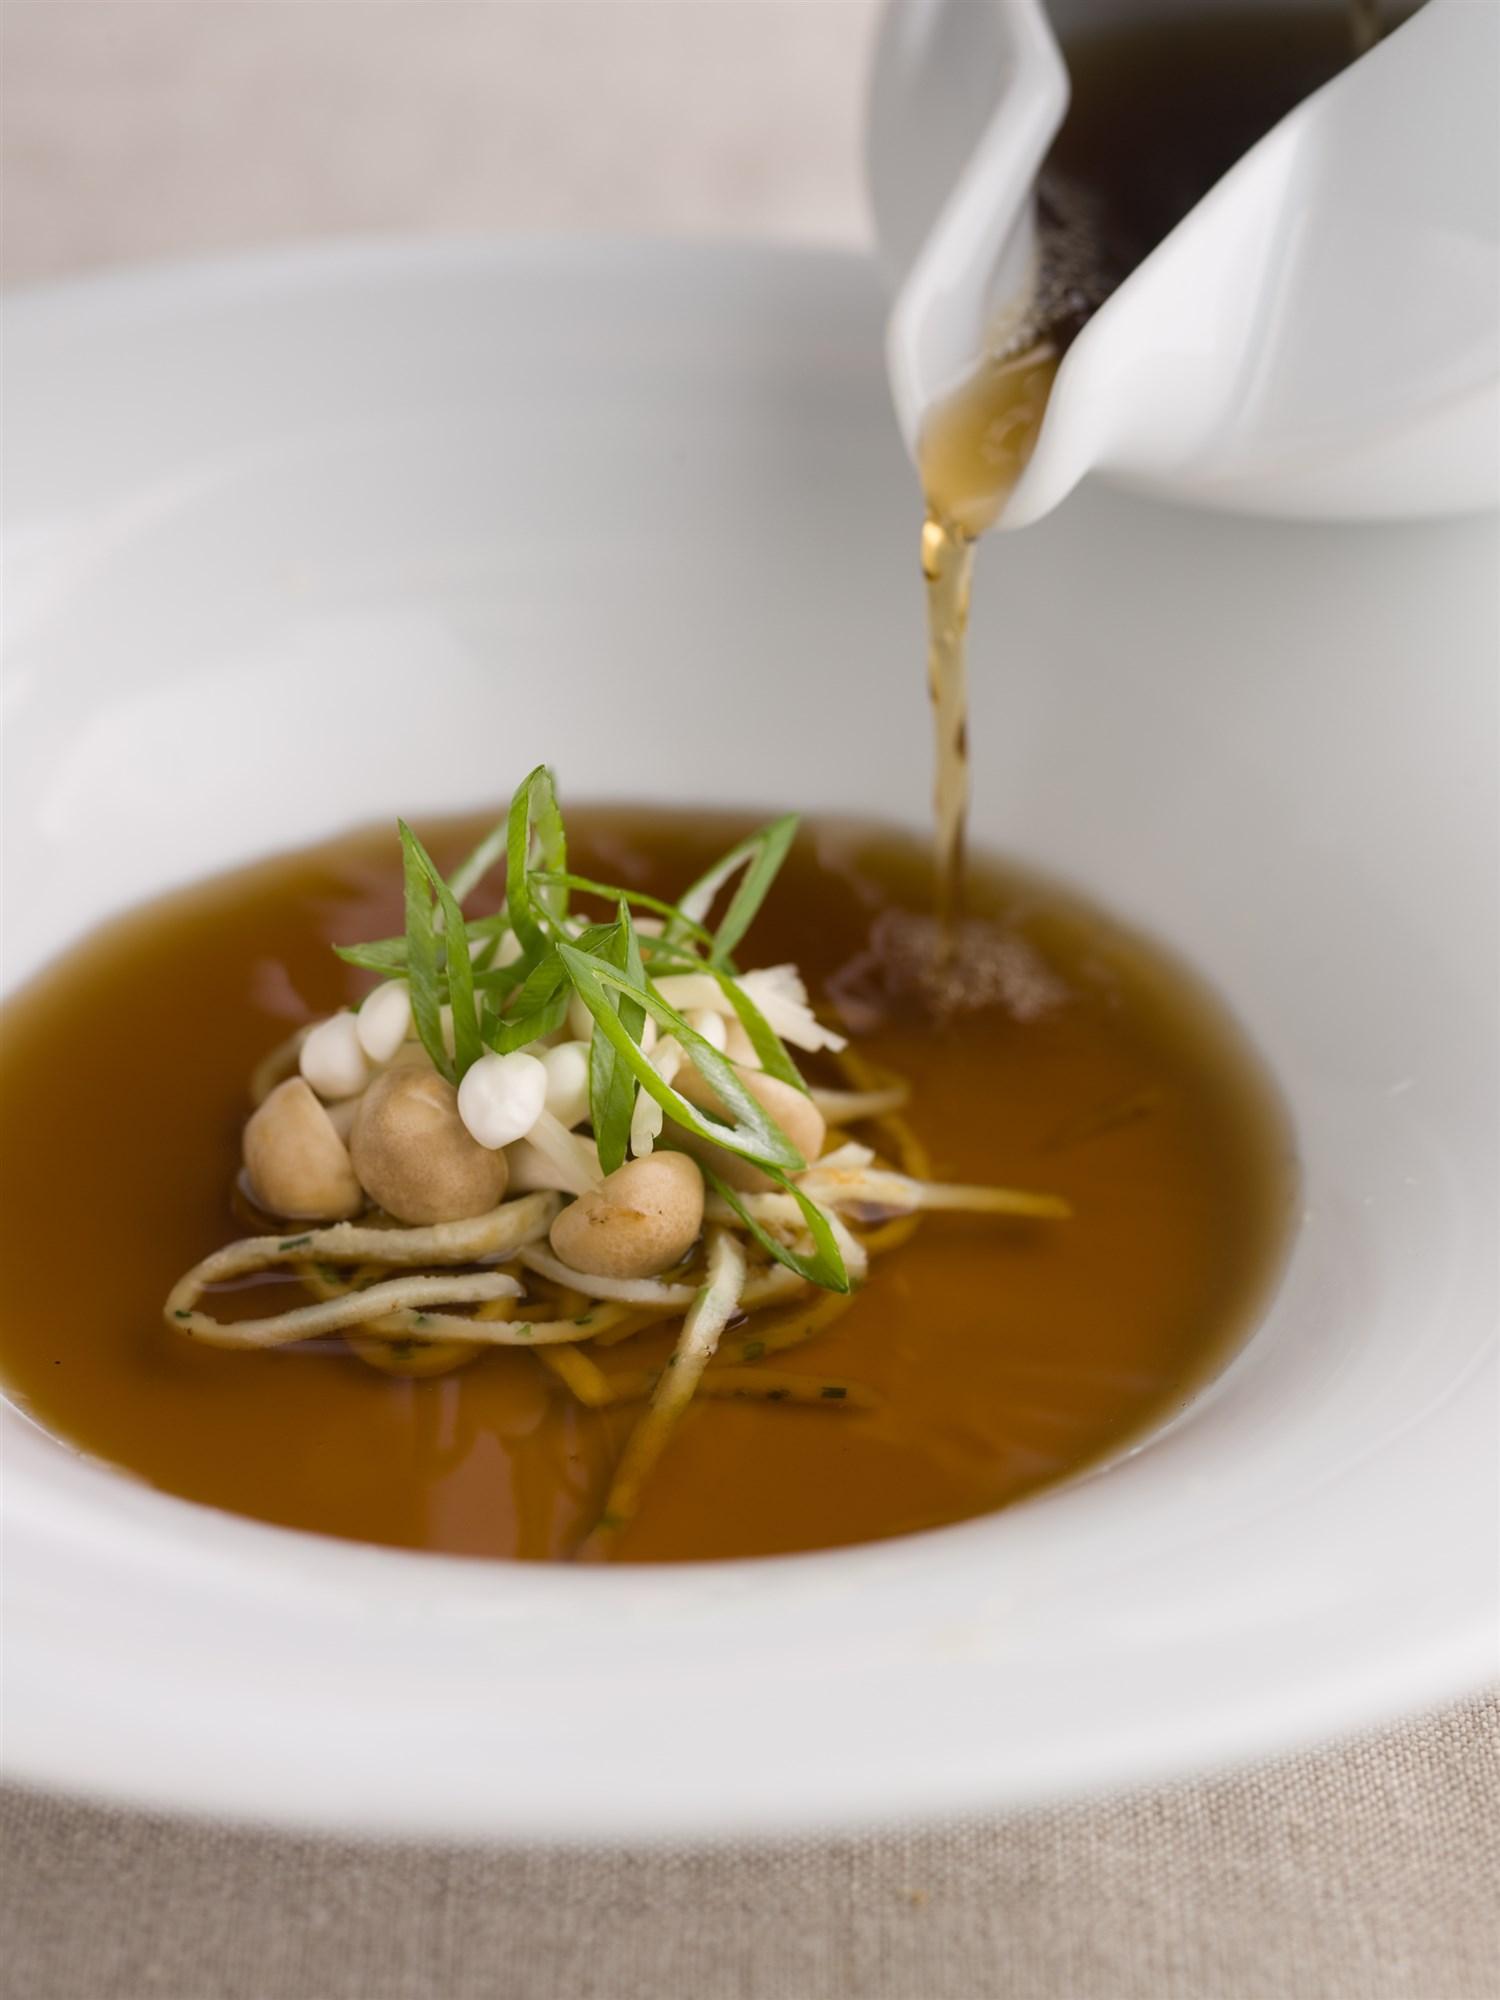 Mushroom consomme at  Araxi . John Sherlock | Courtesy Toptable Group